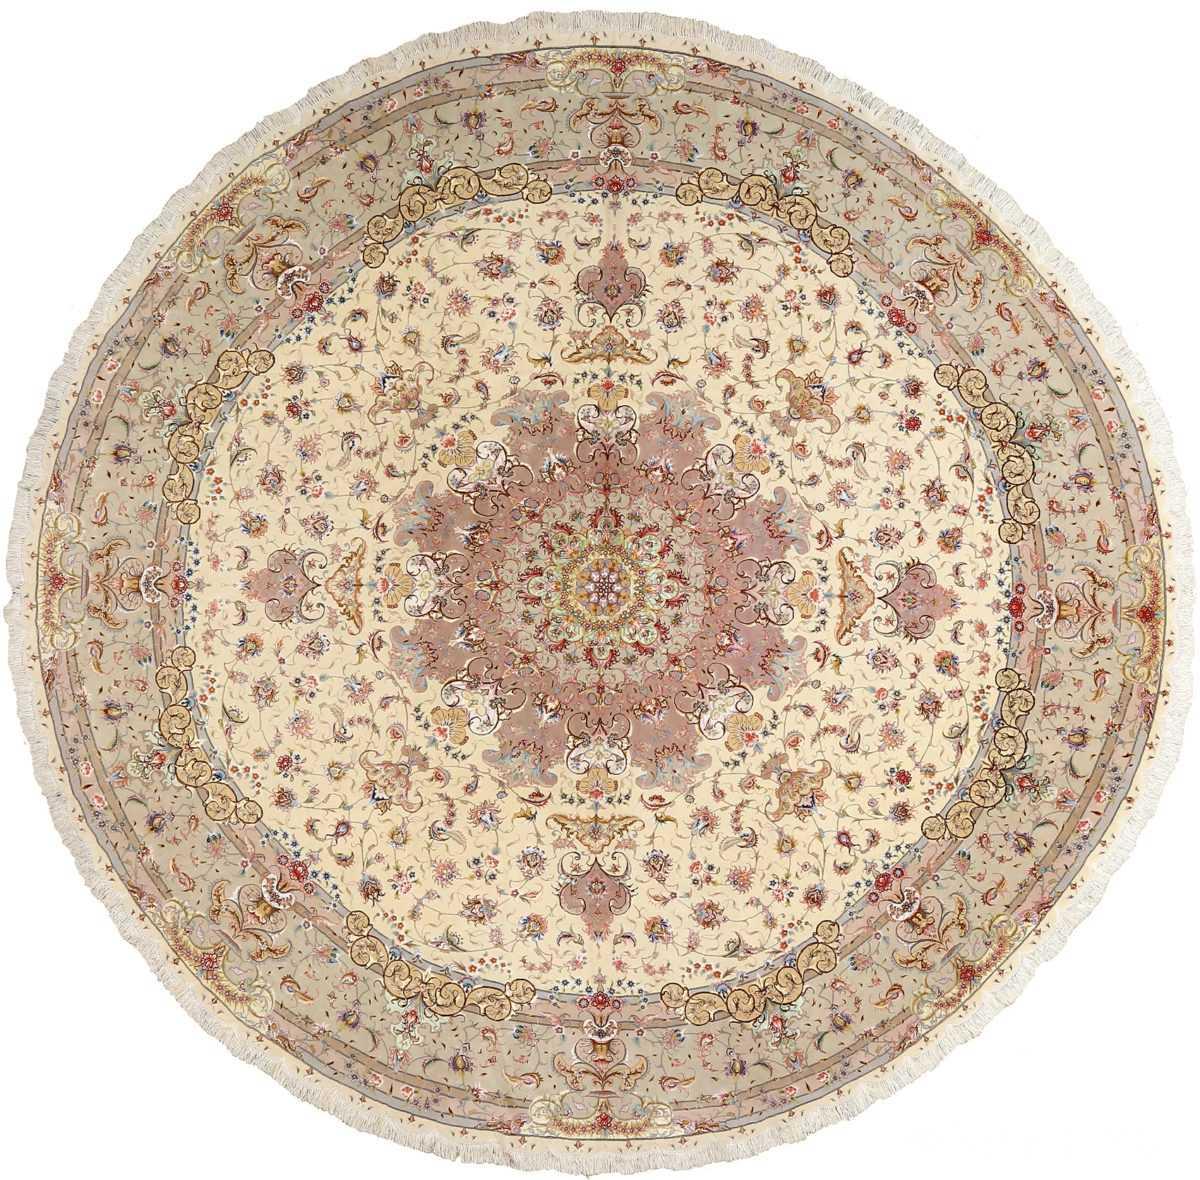 Vintage Persian Rugs: Fine Round Vintage Tabriz Persian Rug 51123 By Nazmiyal